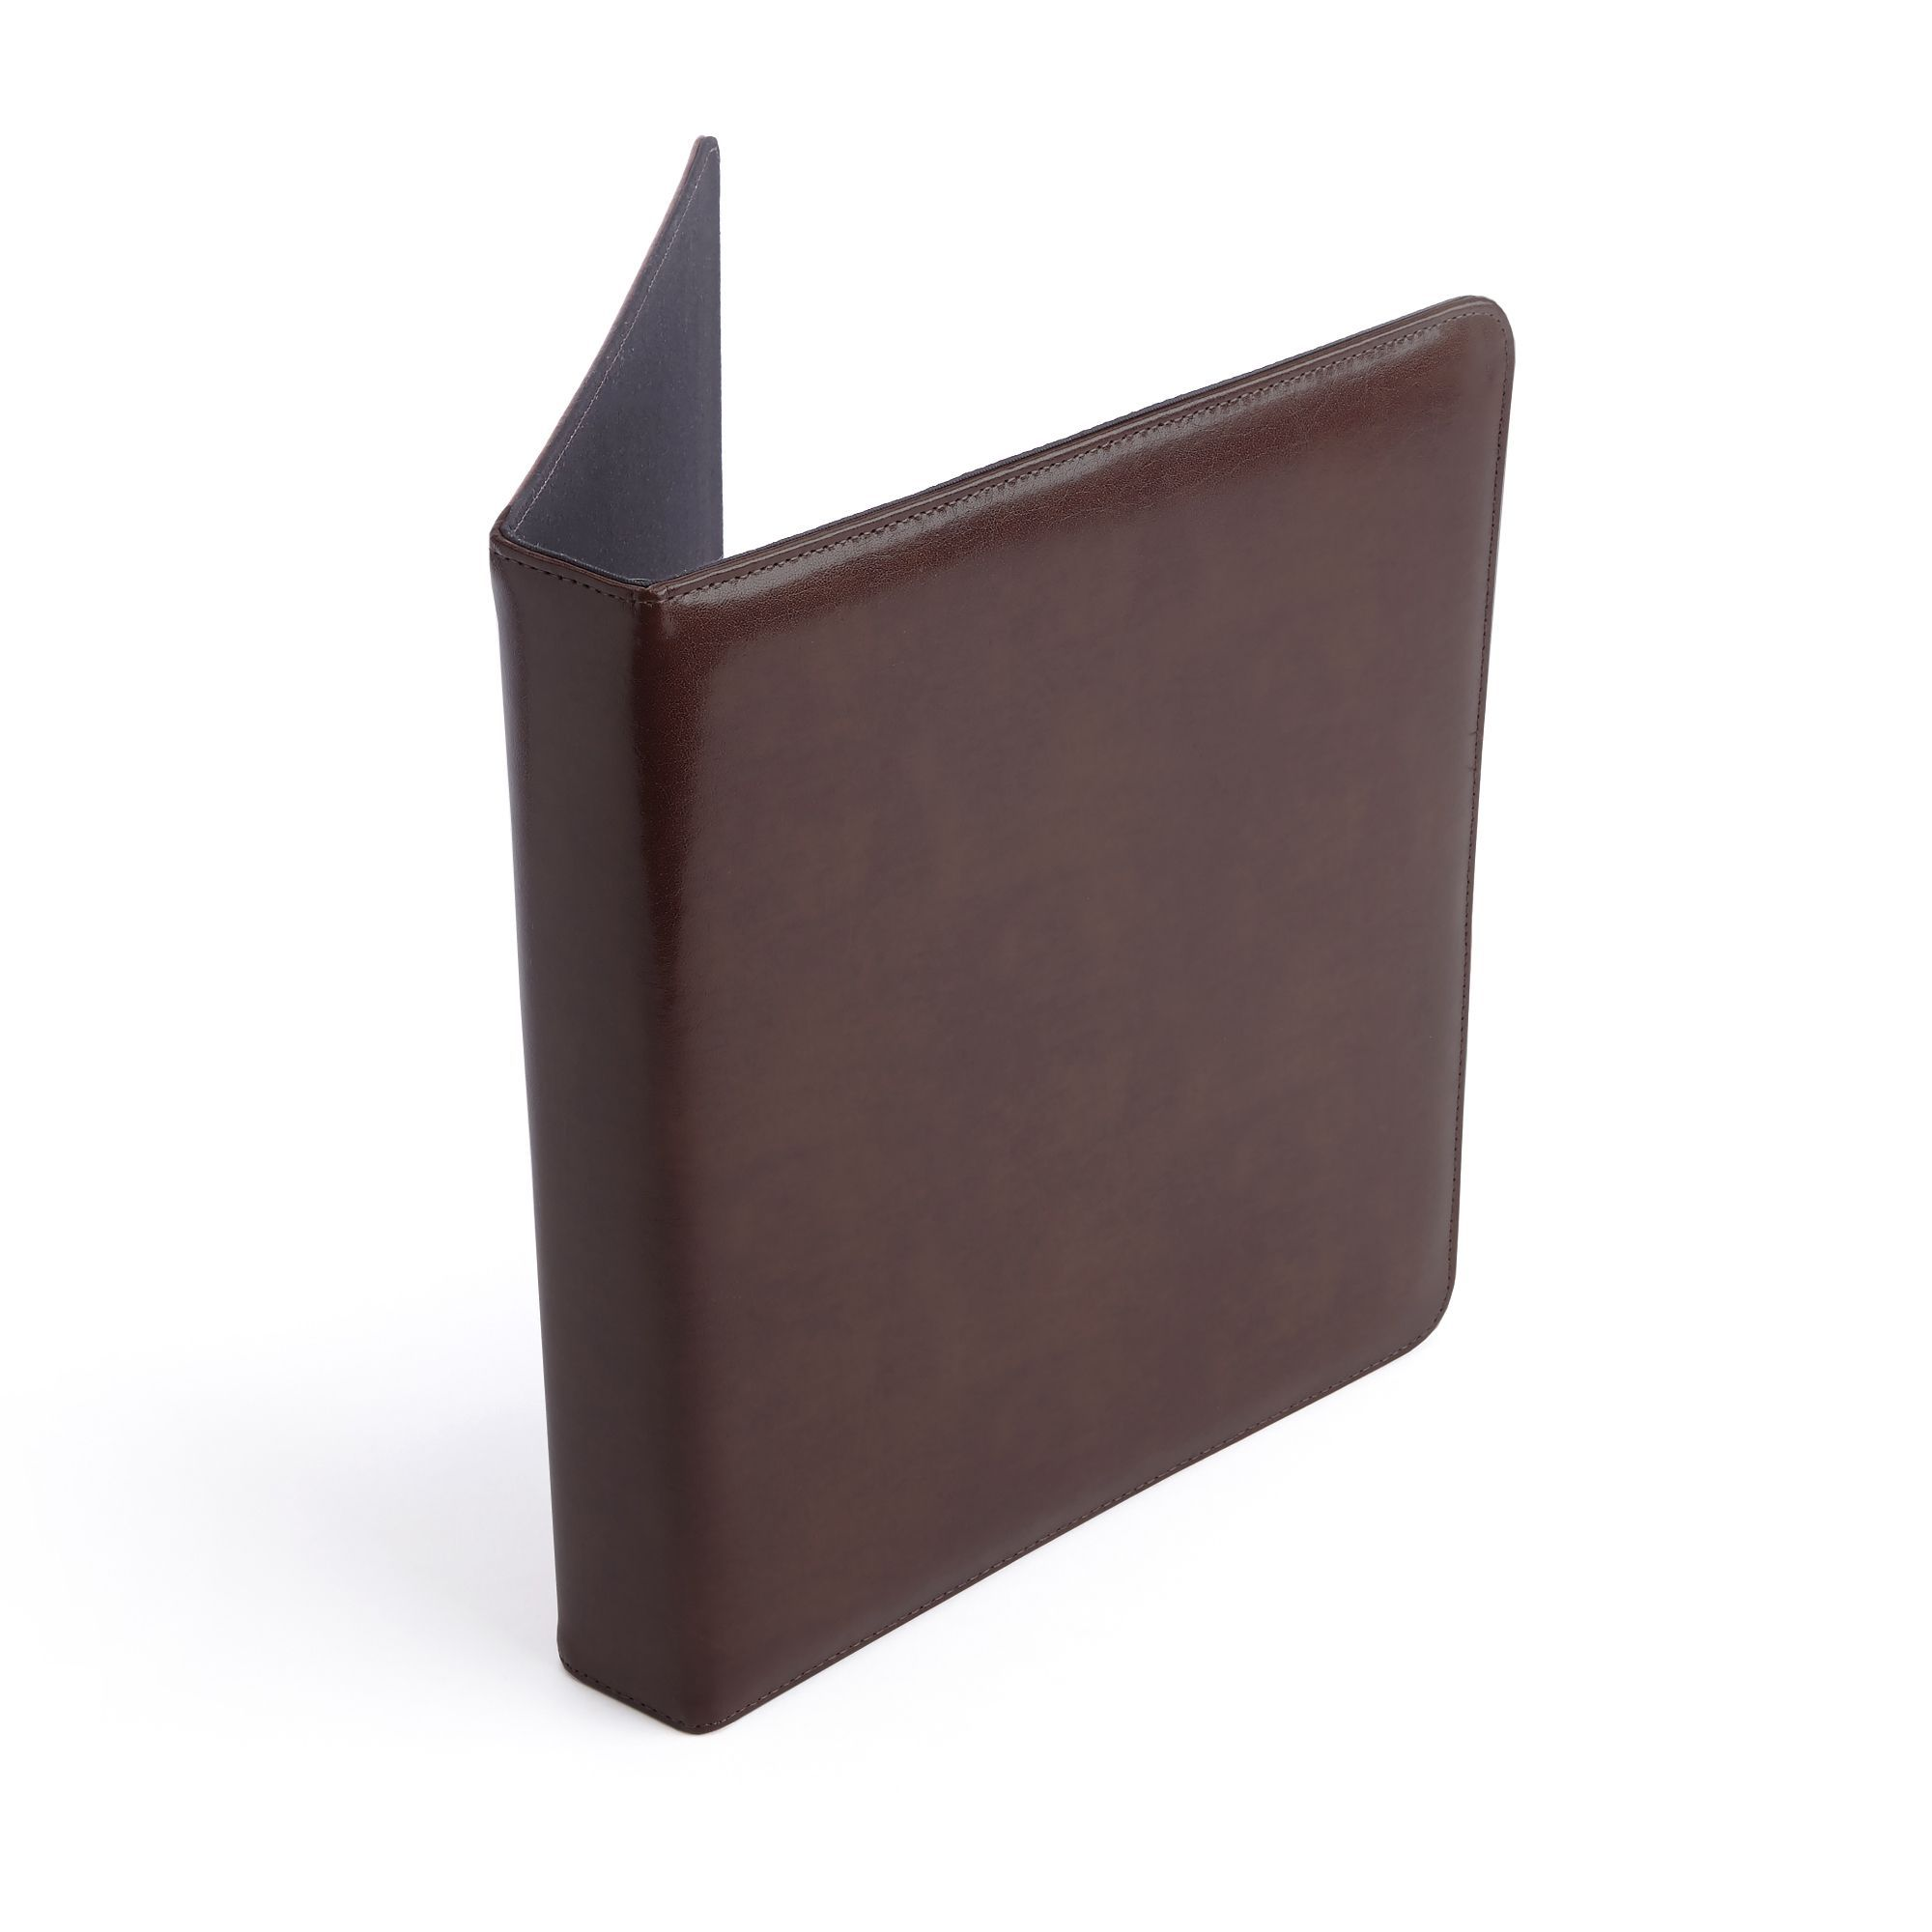 royce executive 1 inch binder document organizer aspirational